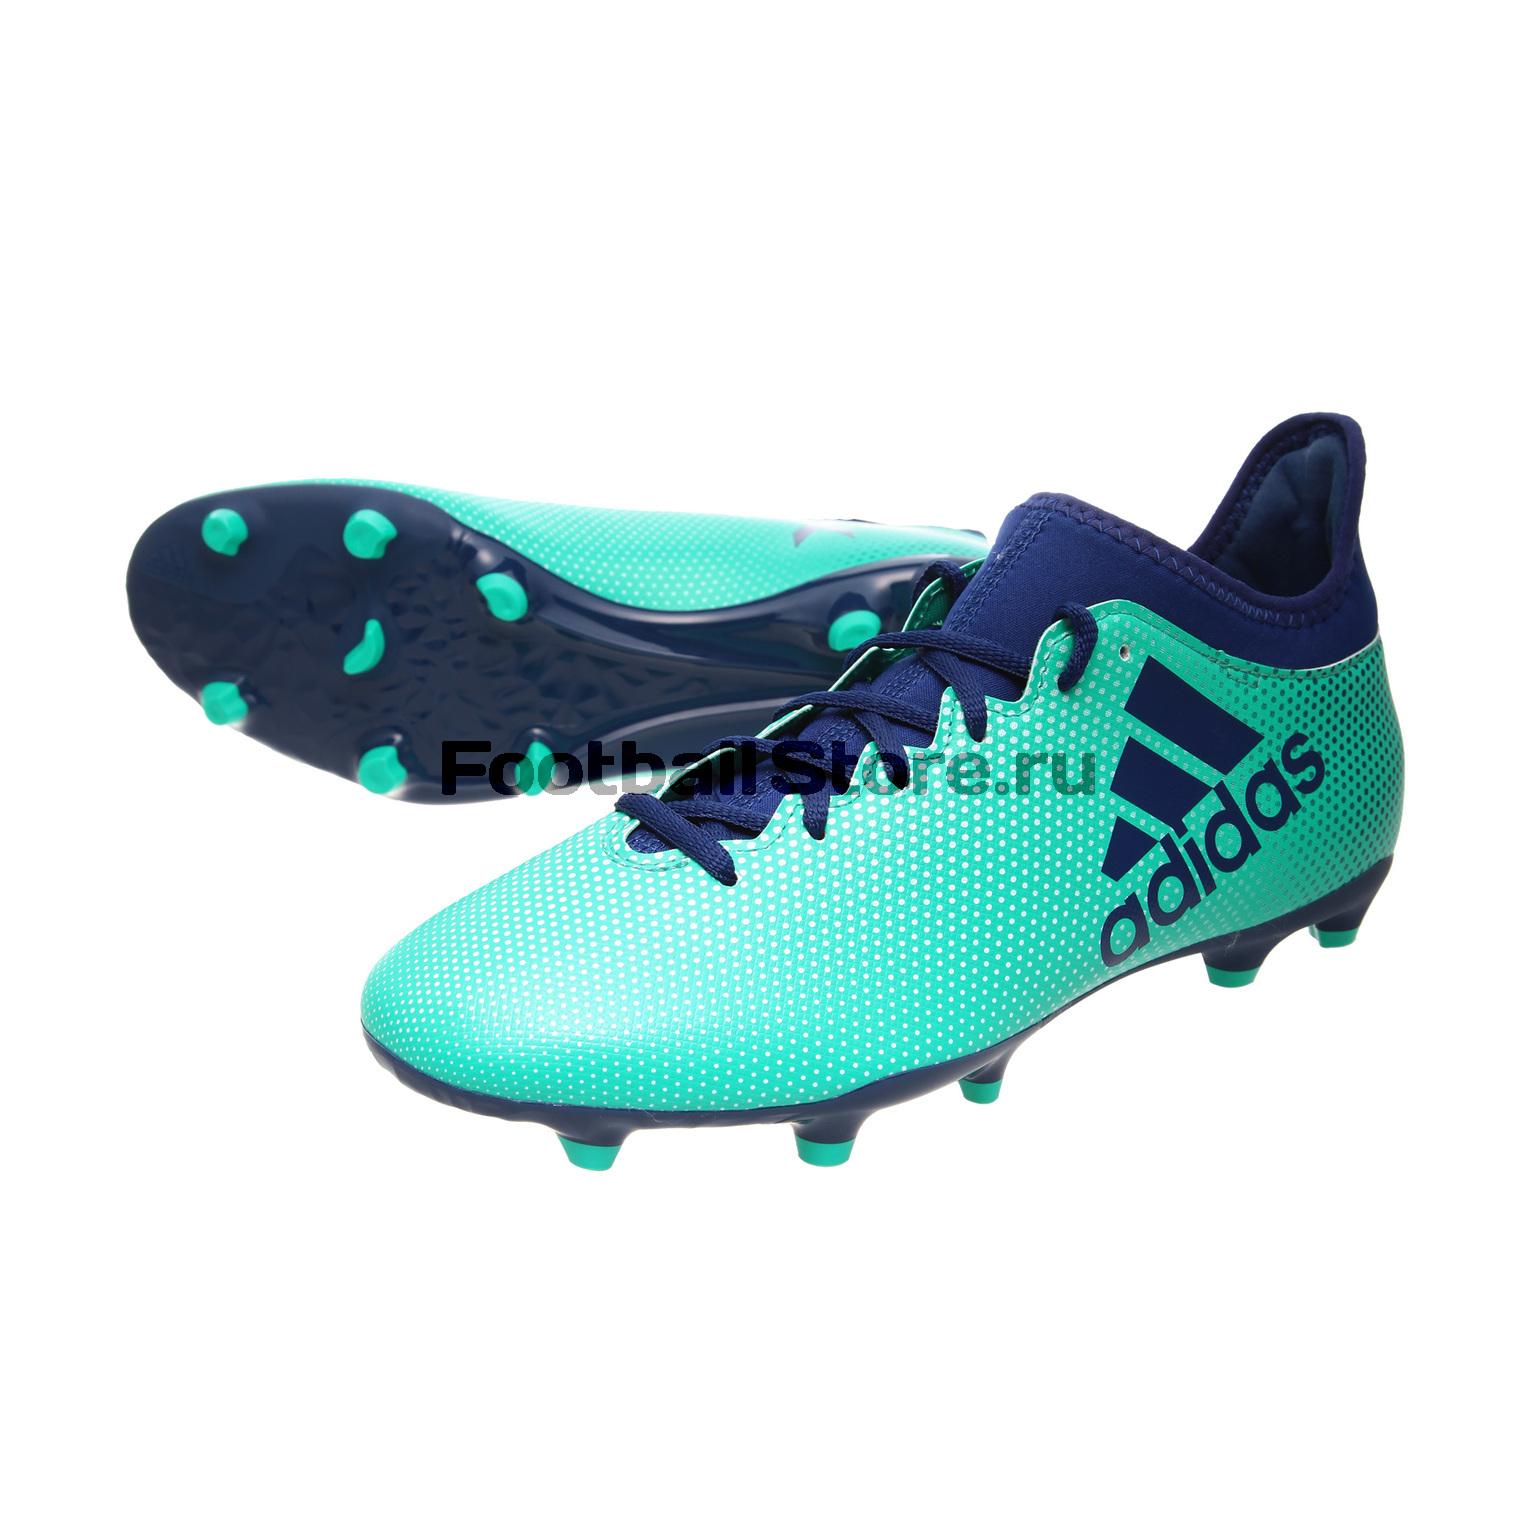 Бутсы Adidas X 17.3 FG CP9194 детские бутсы nike бутсы nike jr phantom 3 elite df fg ah7292 081